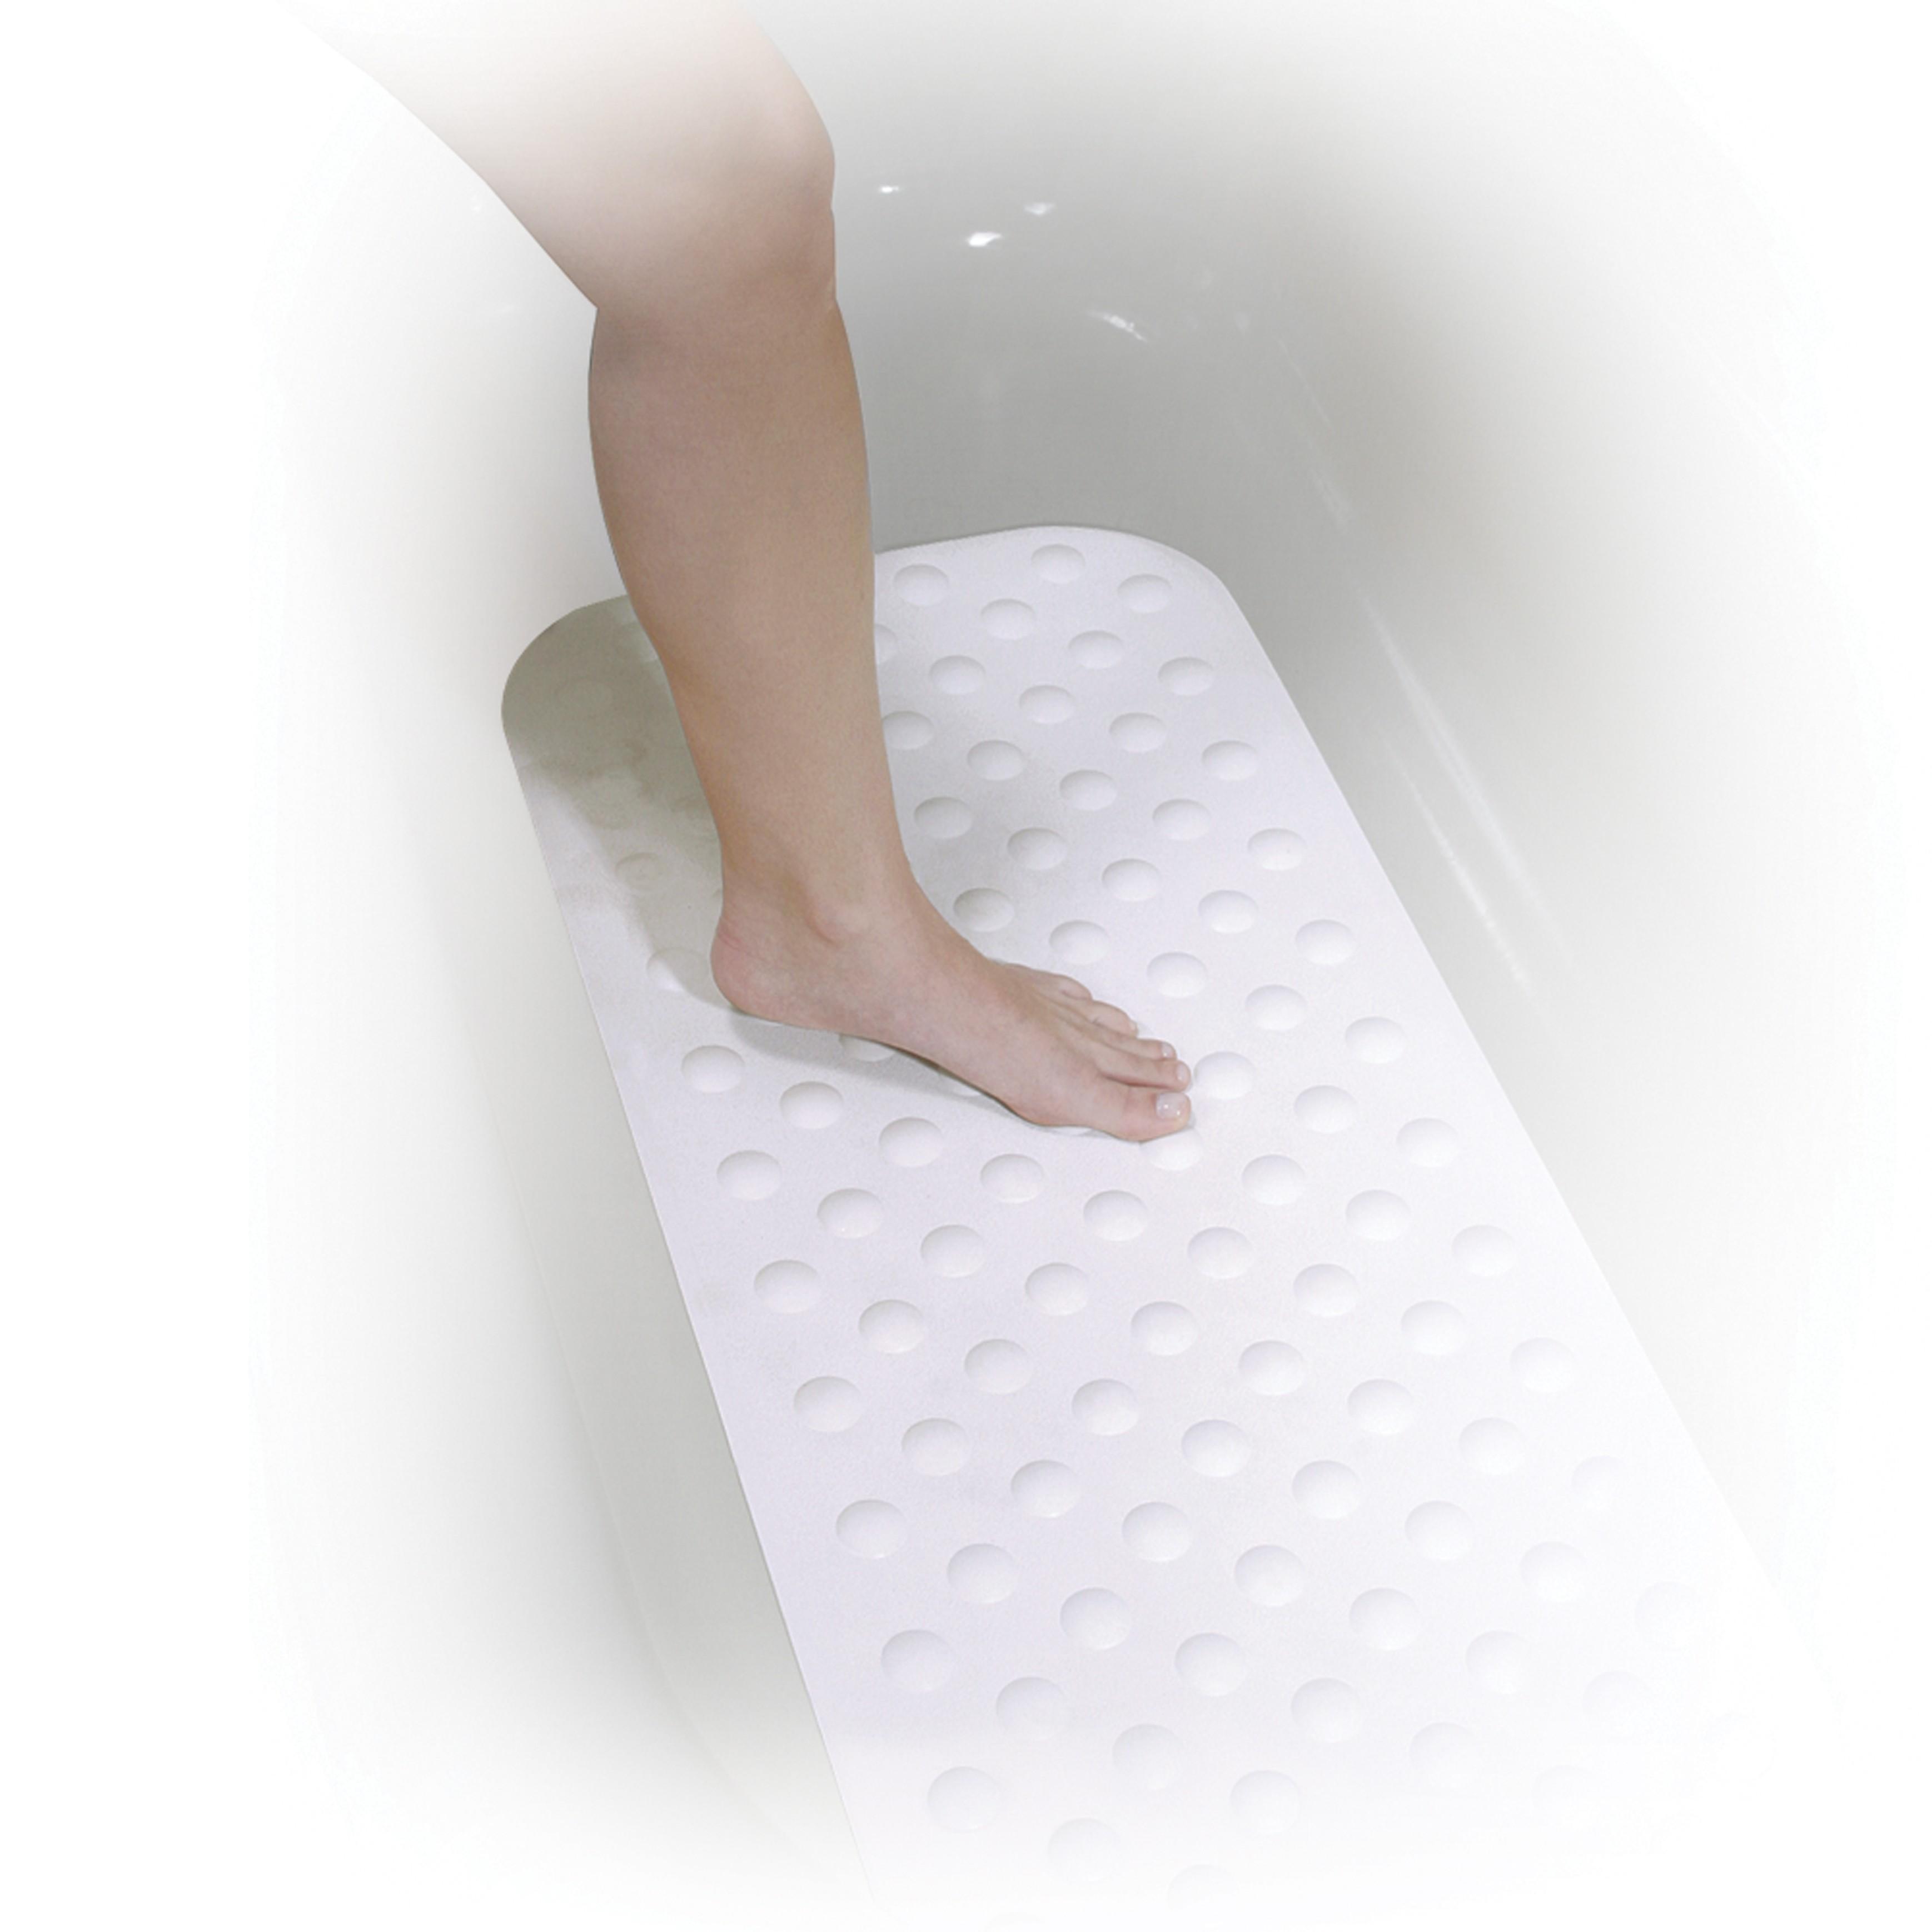 rifton bath chair walmart patio cushions hygiene and toileting system northeast mobility